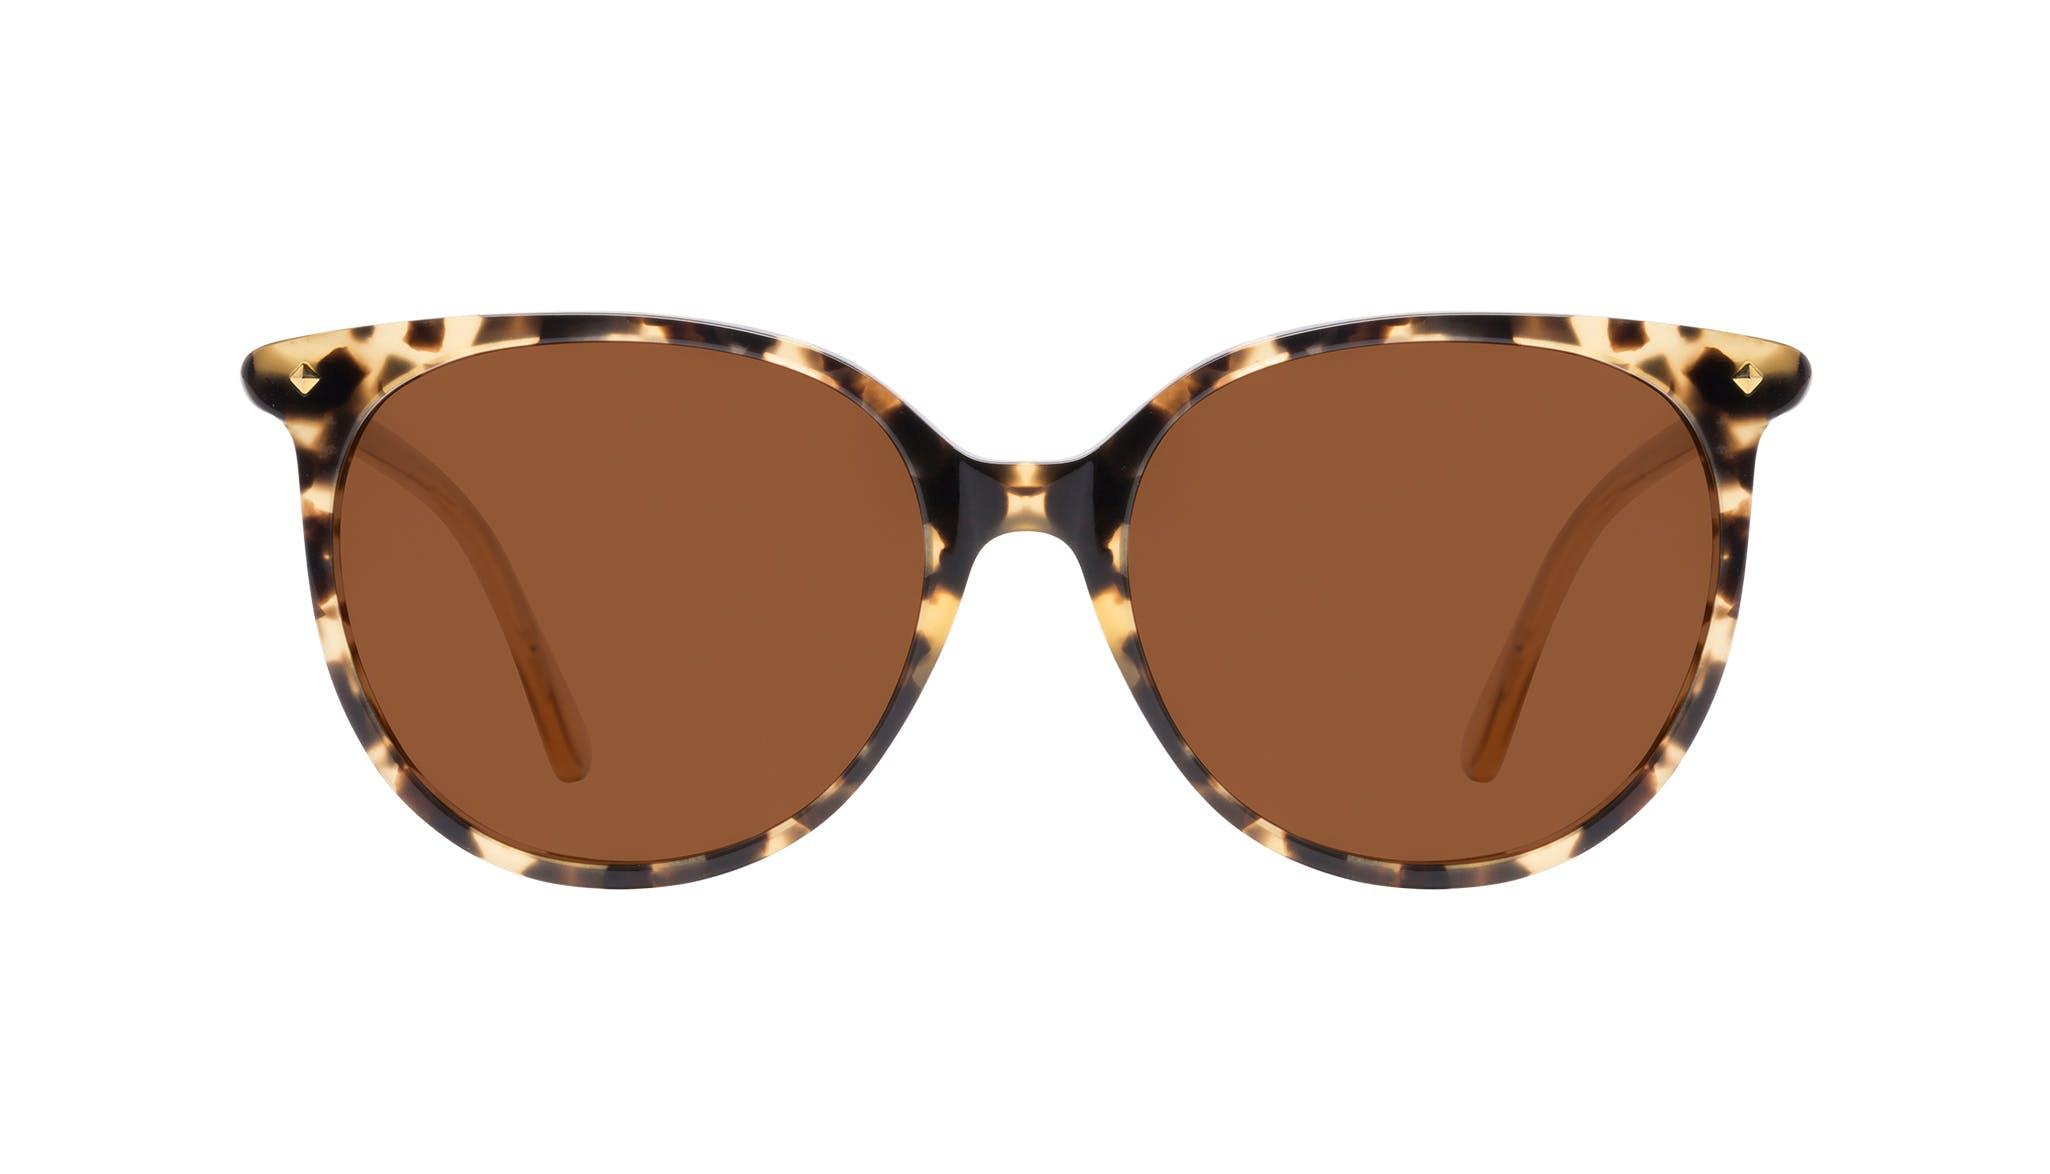 Affordable Fashion Glasses Round Sunglasses Women Area Petite Bingal Front